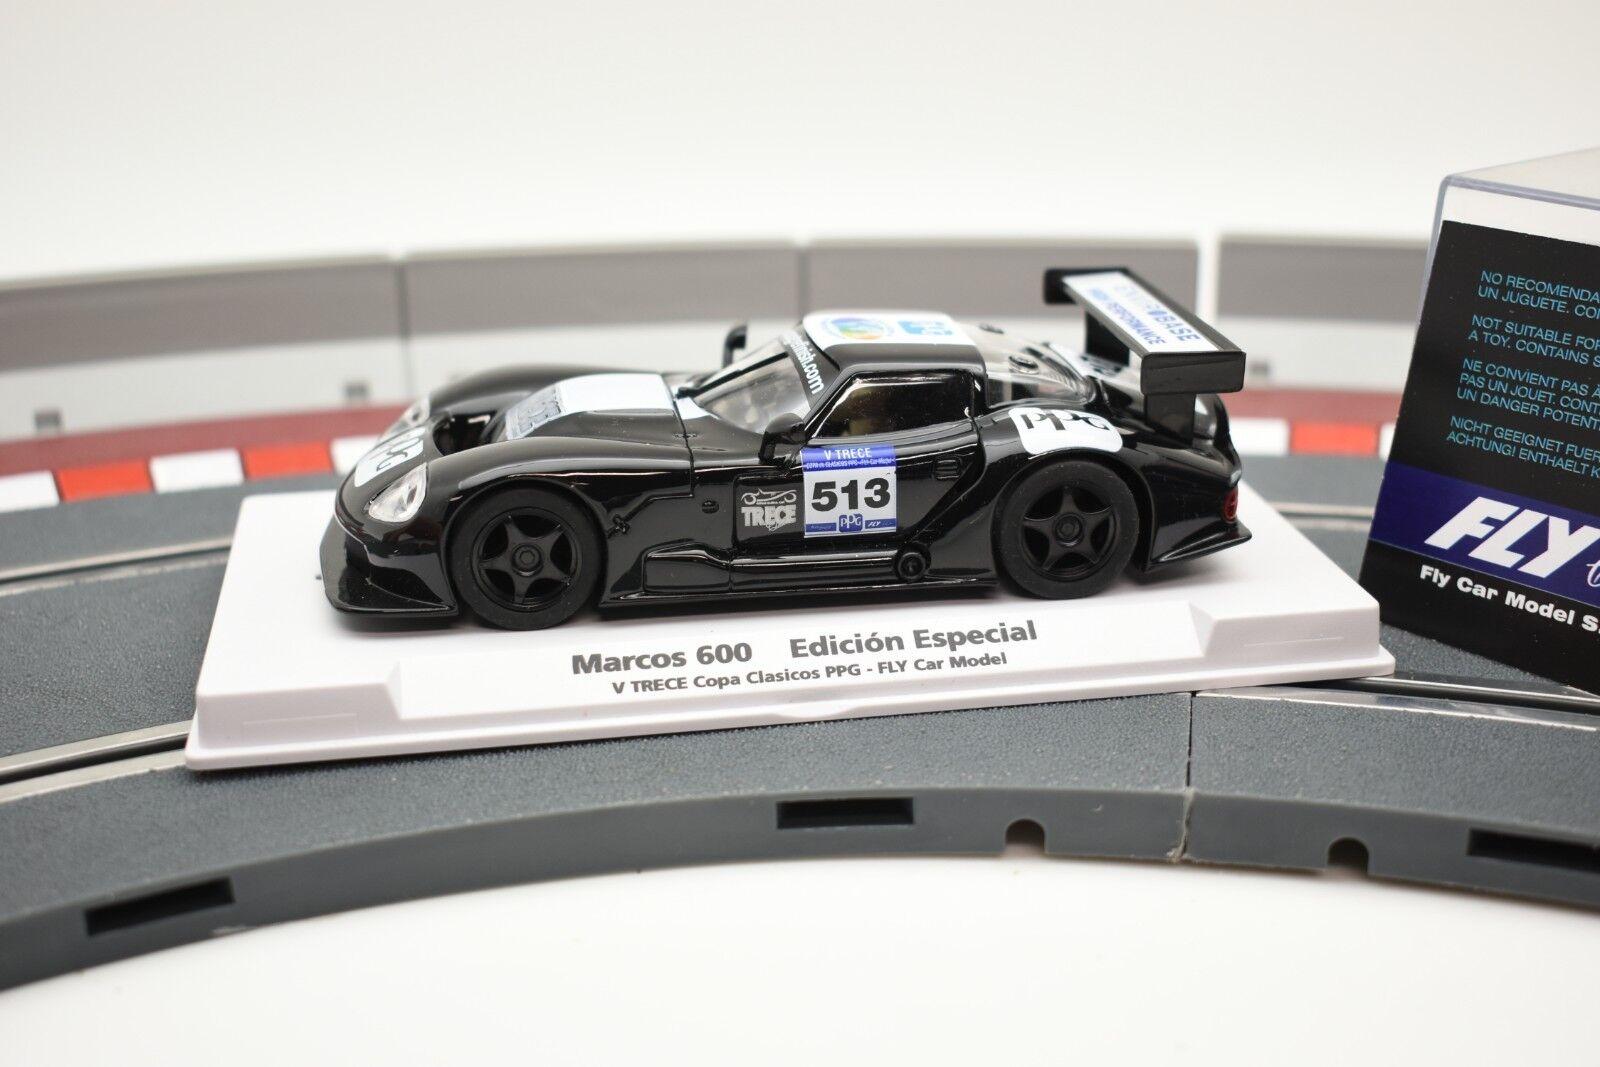 99070 FLY CAR MODEL 1 32 SLOT CAR MARCOS LM600 ED. ESPECIL V TRECE